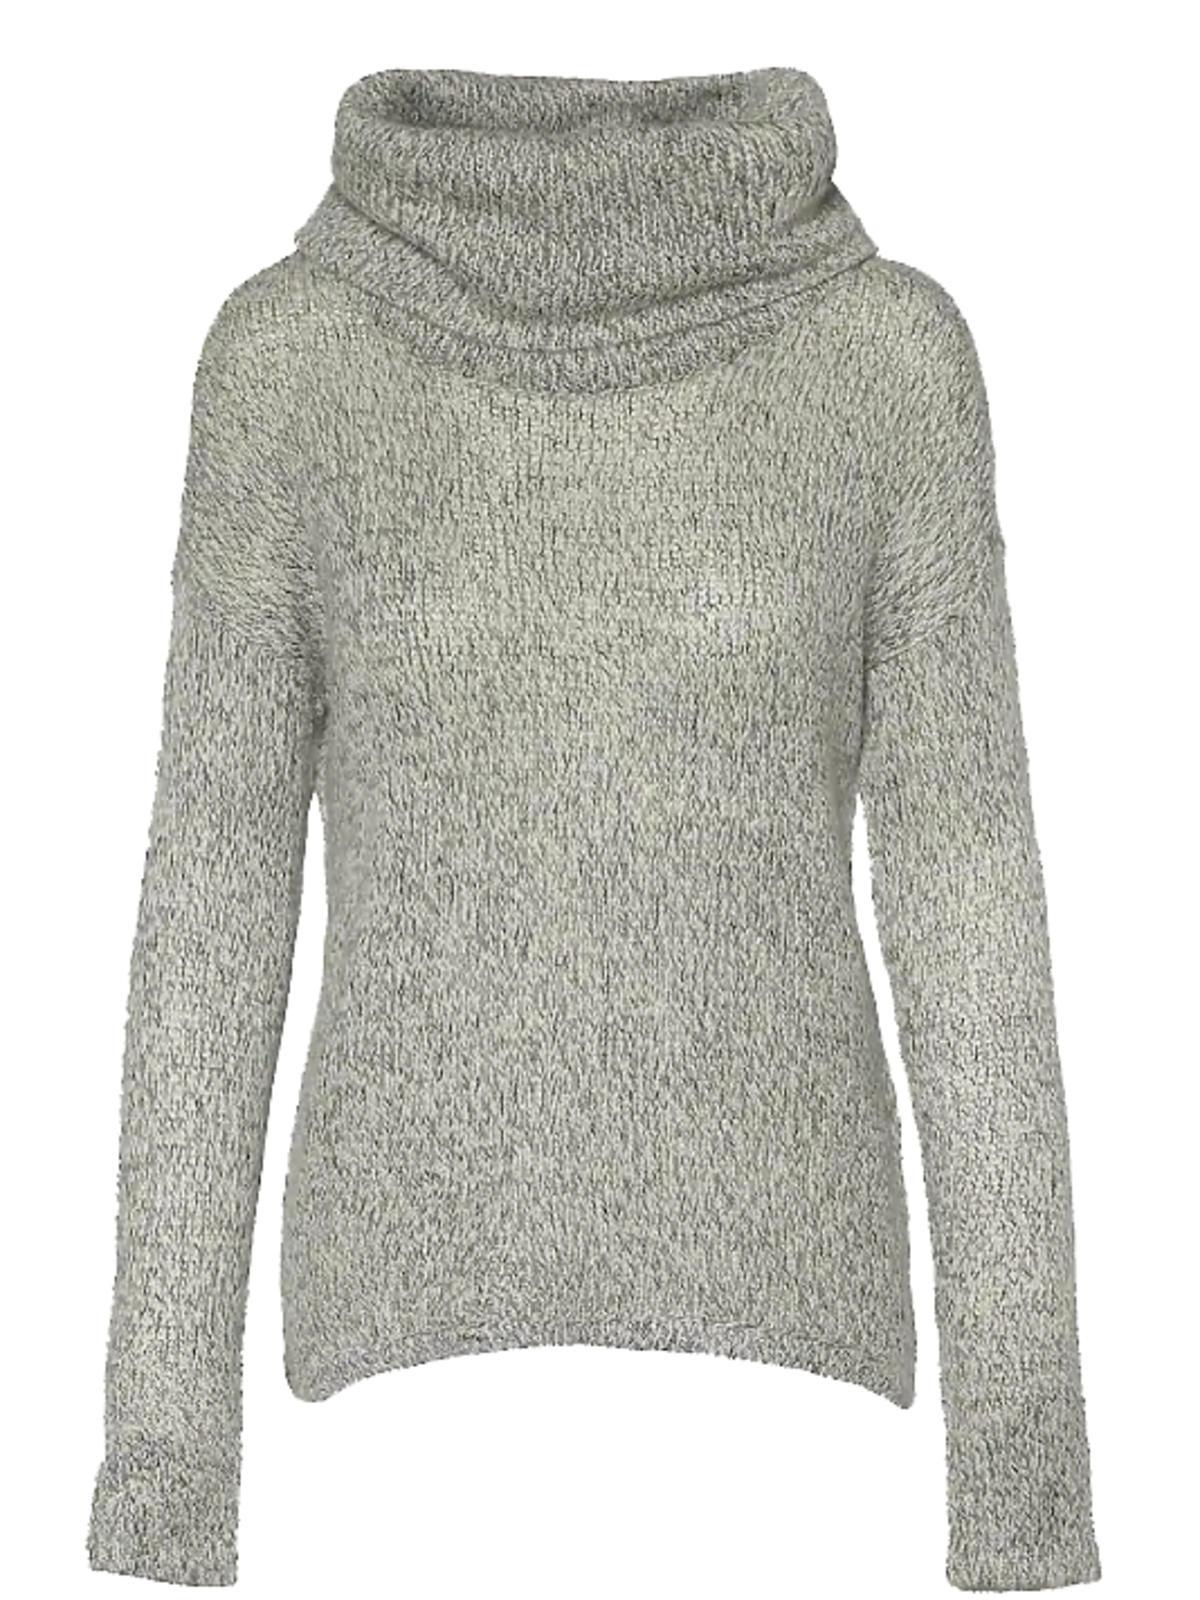 Sweter Vero Moda 83,60 zł